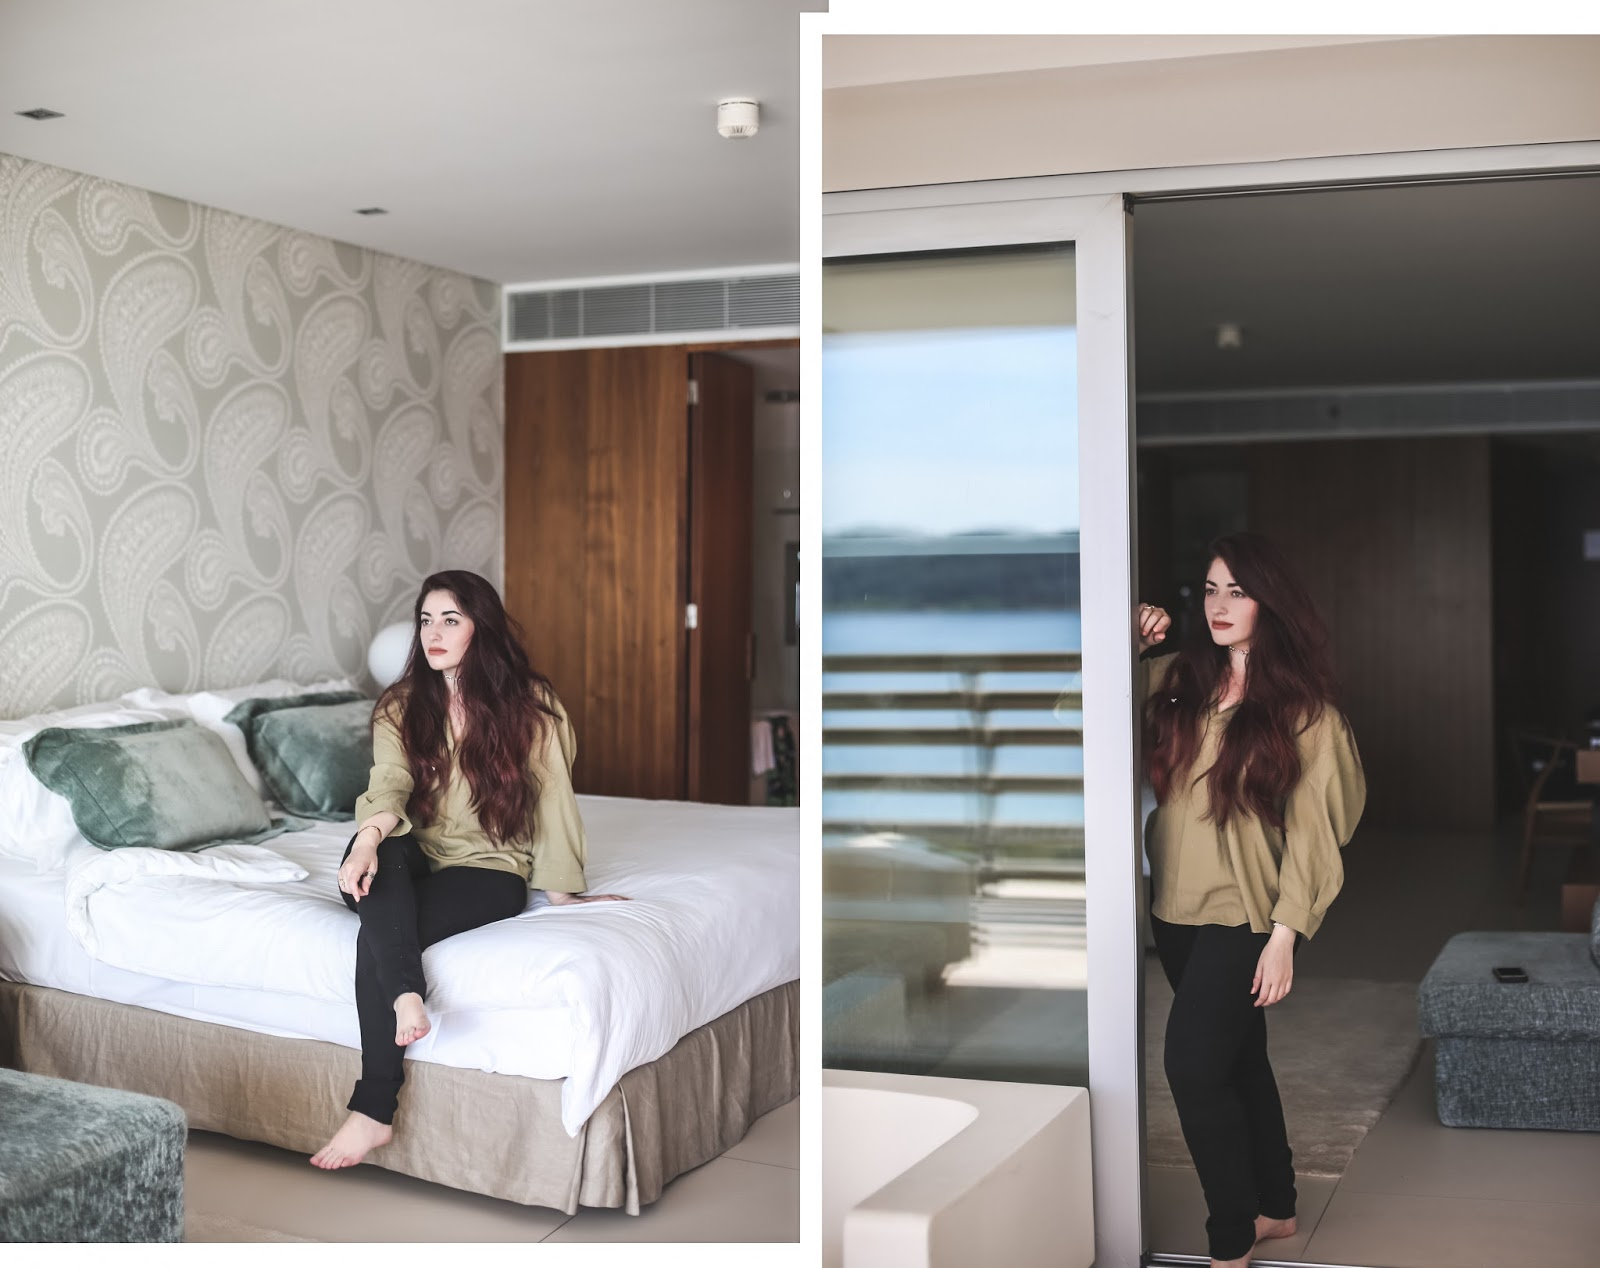 Tróia design hotel venus is naive